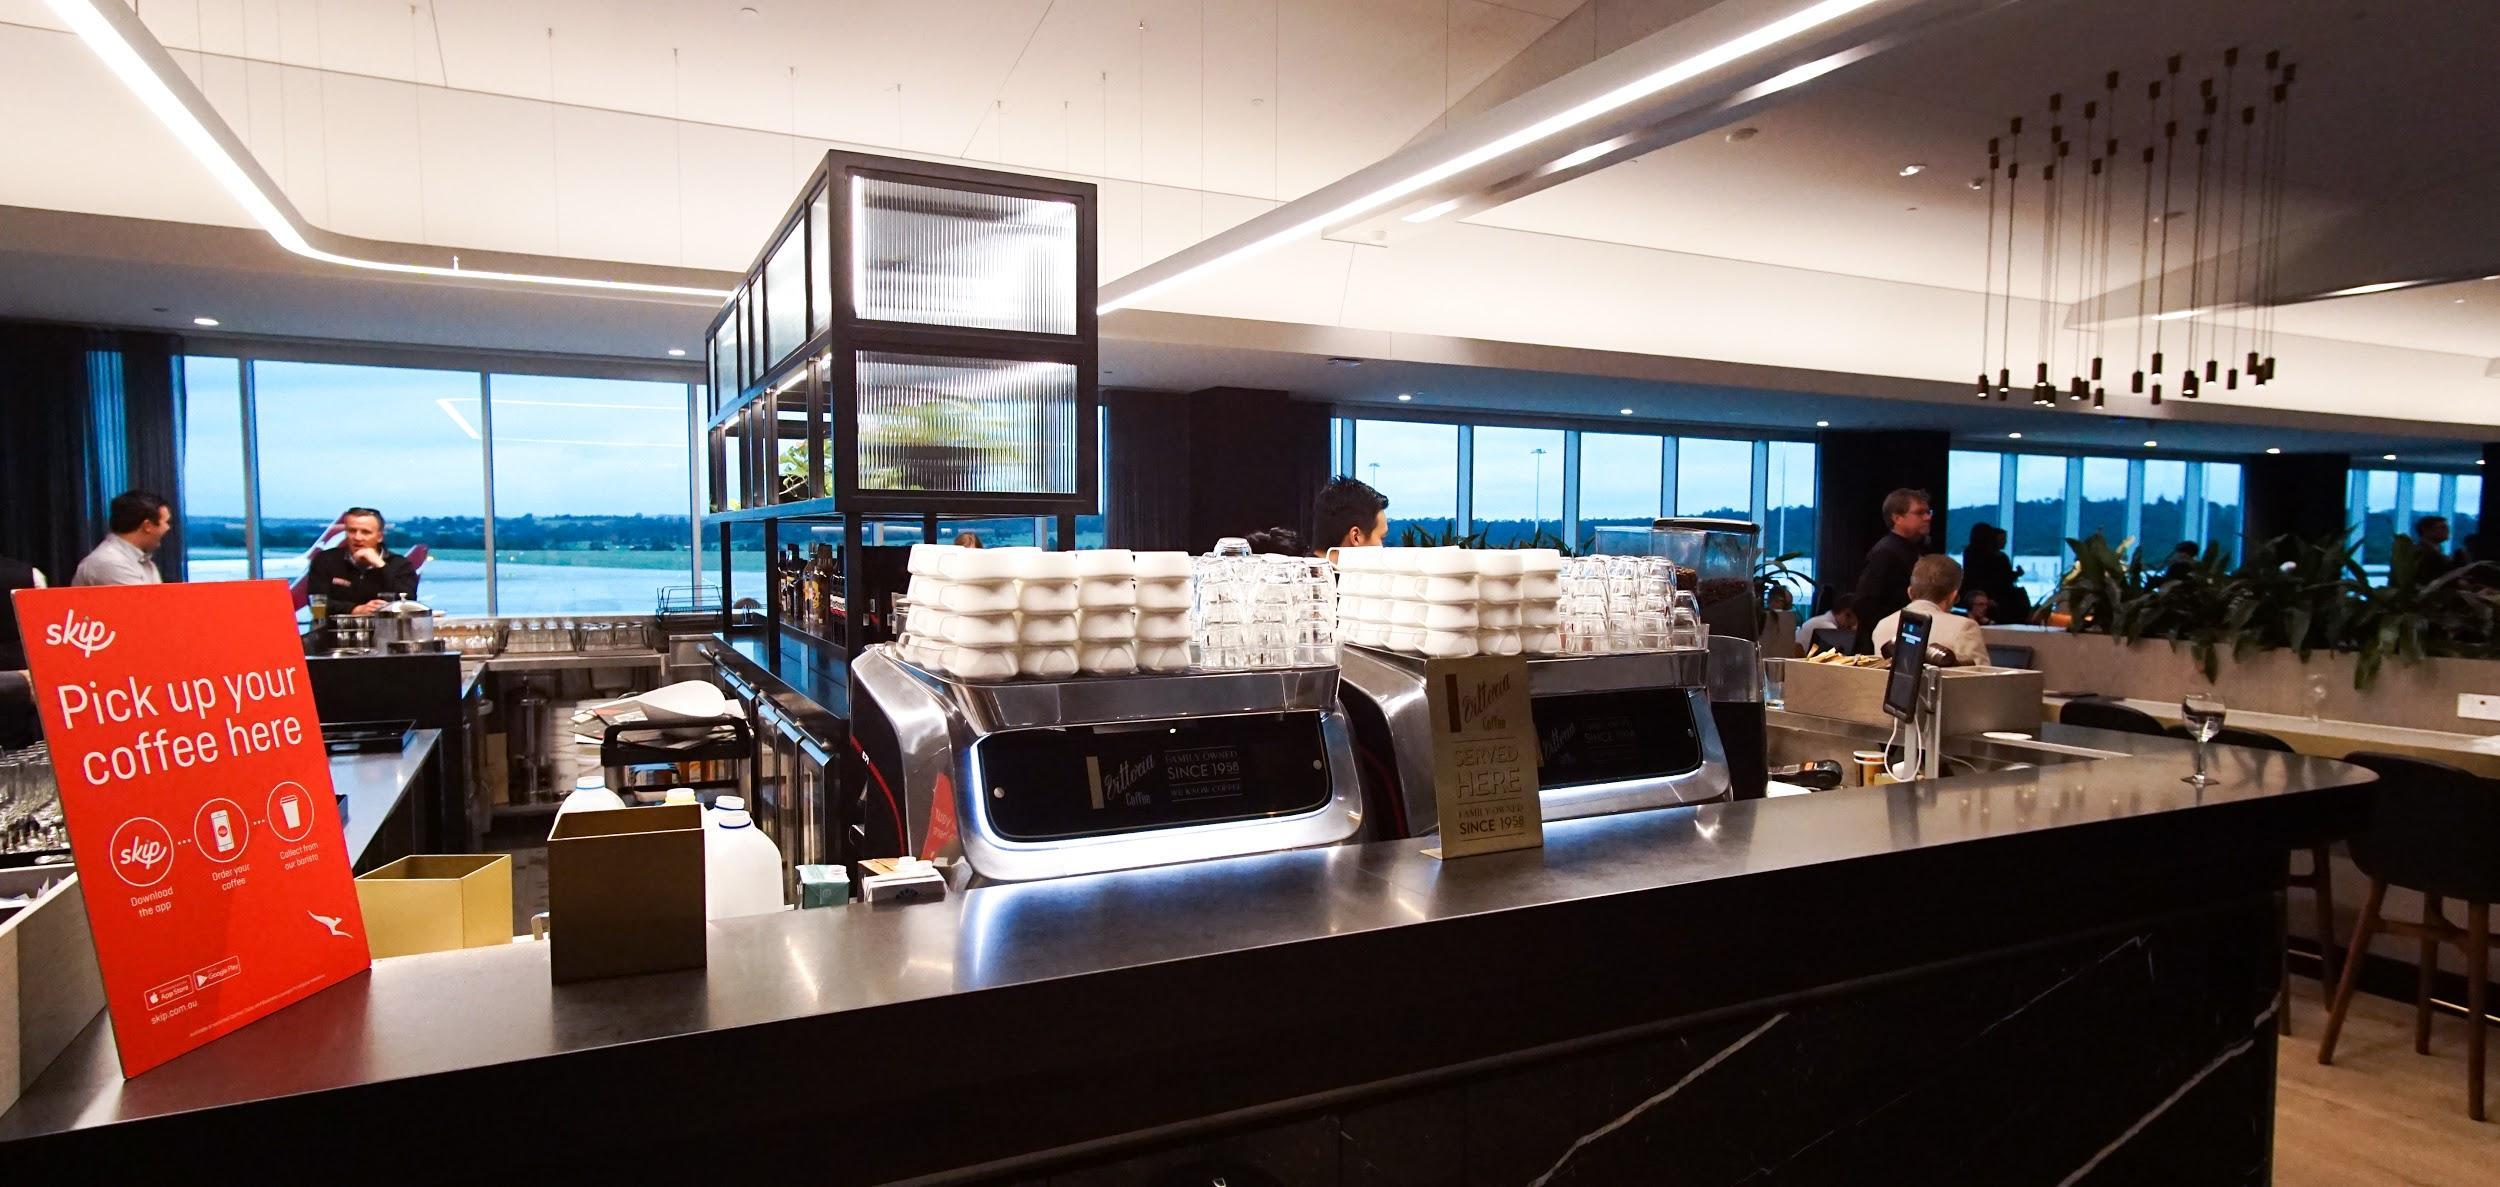 Qantas Domestic Business Lounge Melbourne barista bar